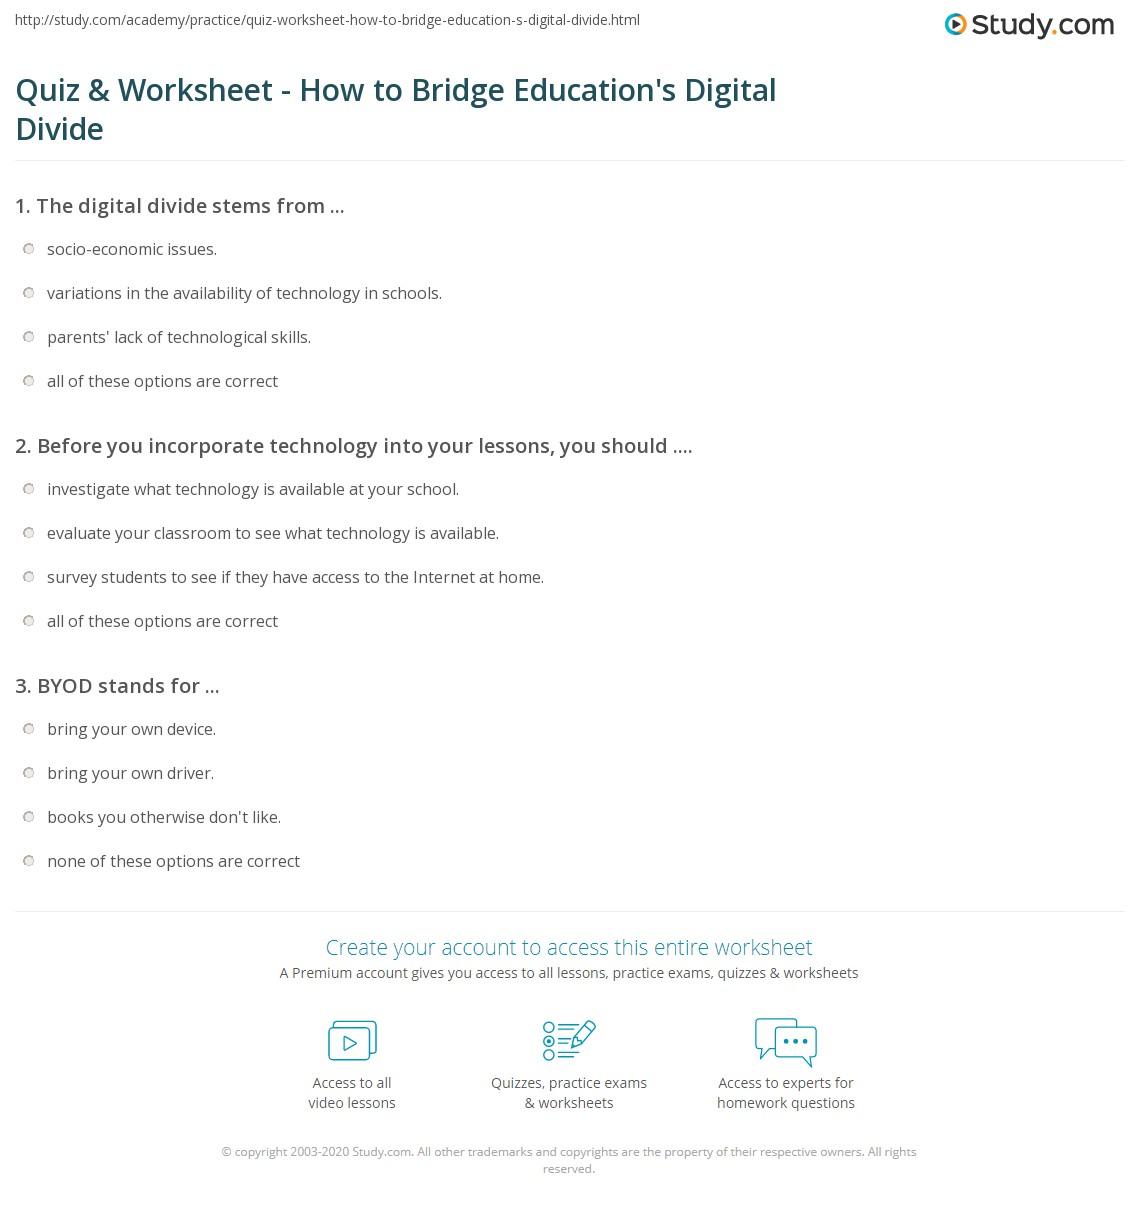 Worksheets Driver Education Worksheets quiz worksheet how to bridge educations digital divide study com print bridging the in education worksheet